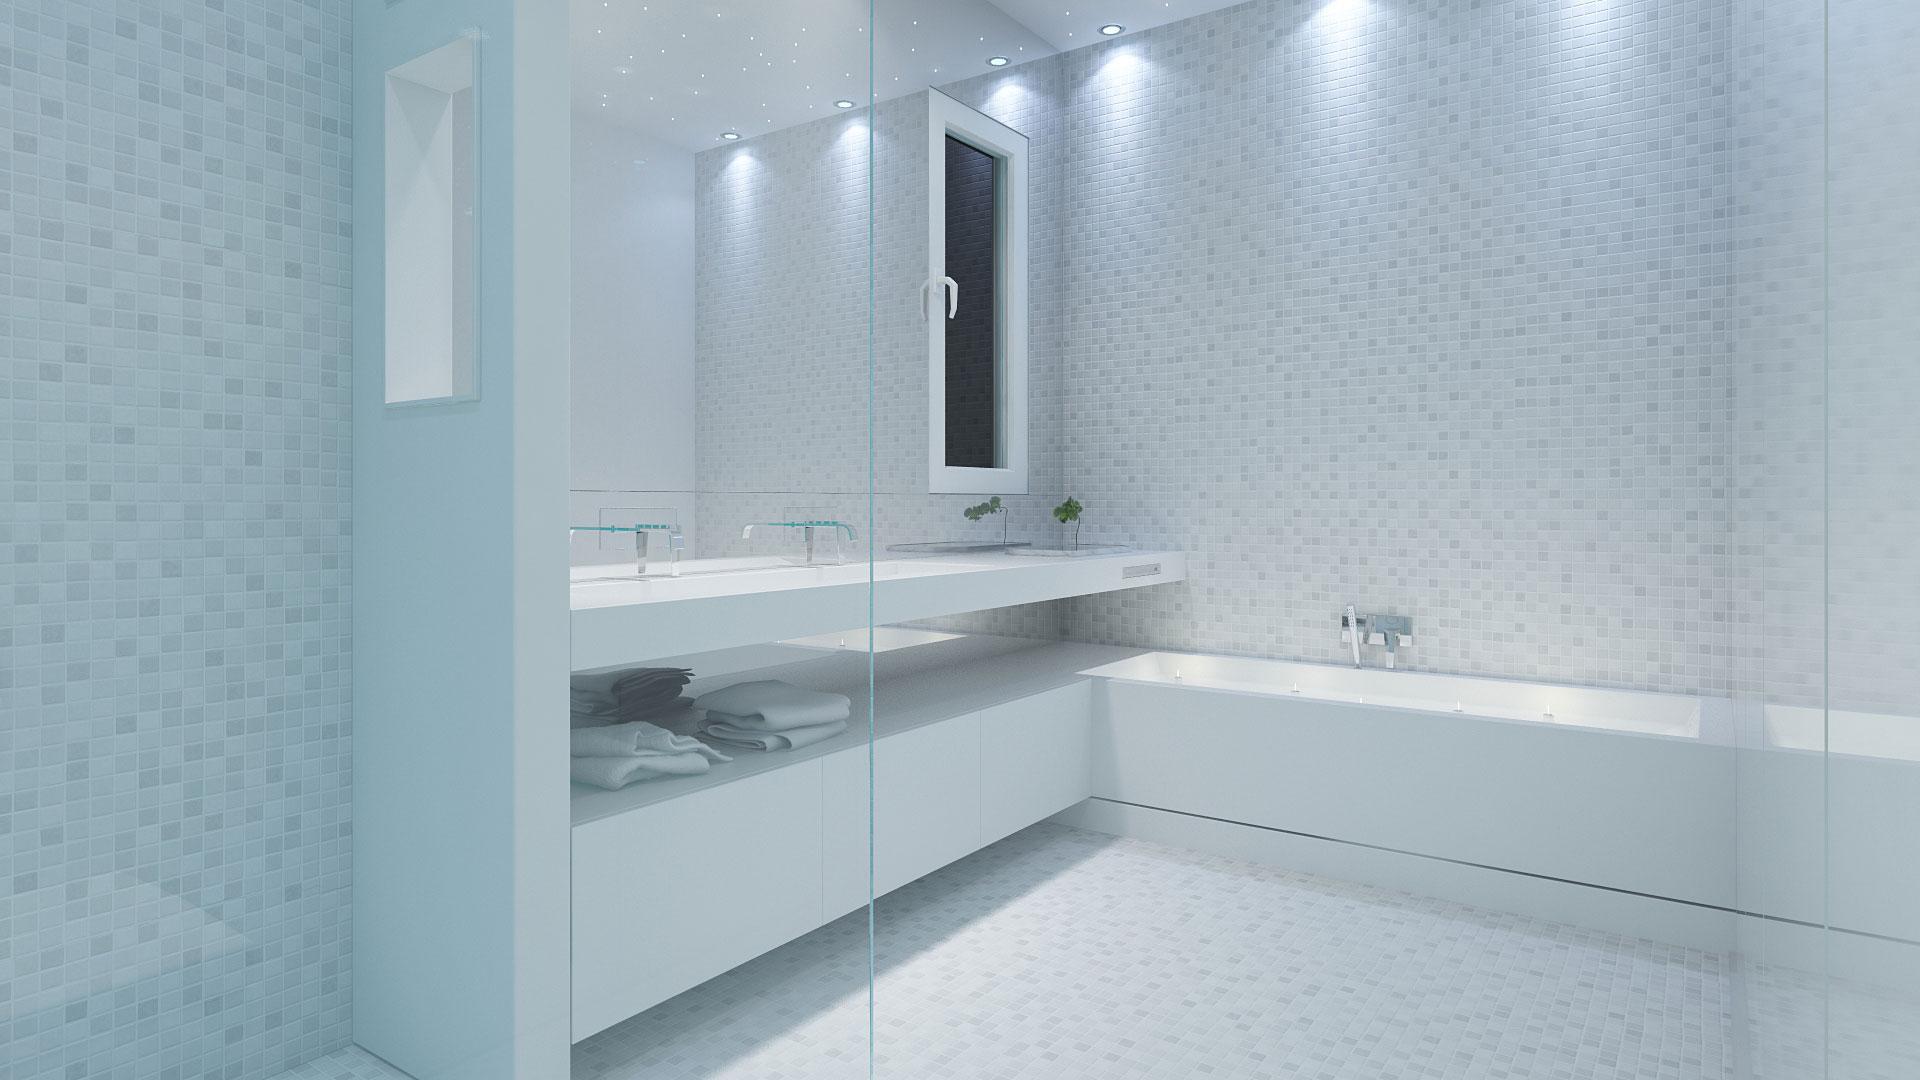 salle de bain design, salle de bain minimaliste, salle de bain contemporaine, salle de bain, salle de bain moderne, mosaique design, plan vasque hi mac, plan vasque lg,